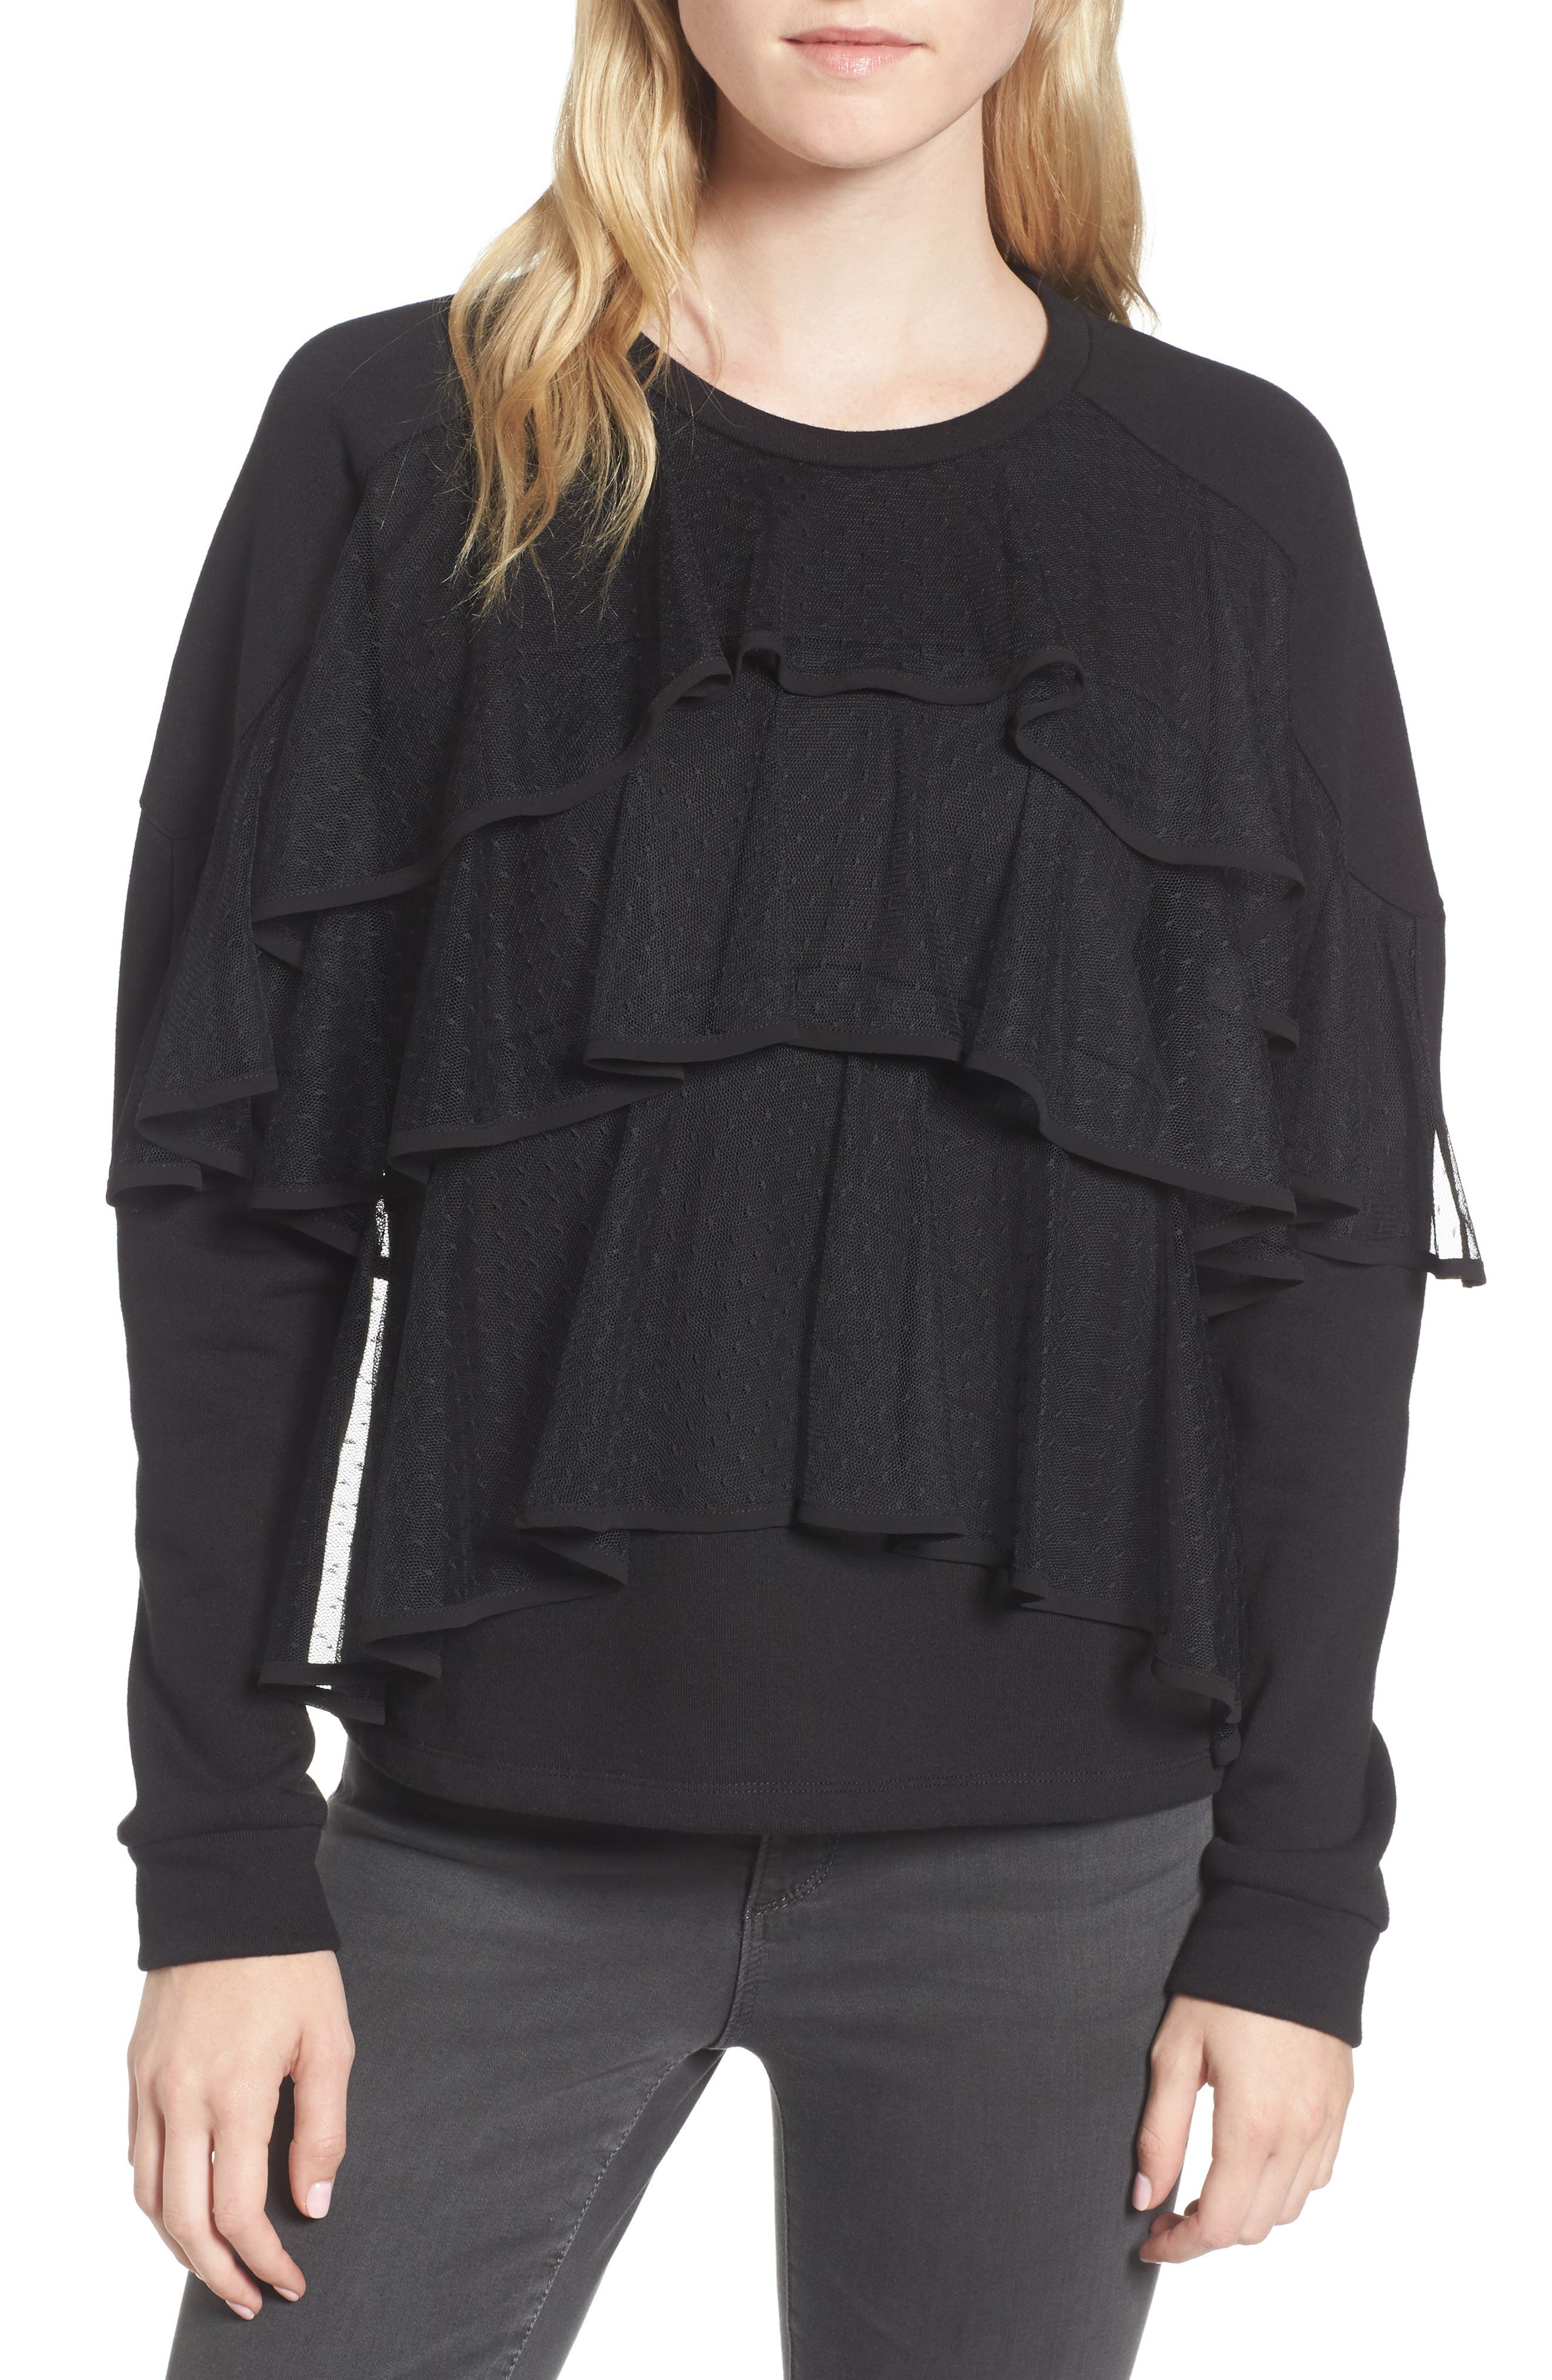 Alternate Image 1 Selected - Chelsea28 Mesh Ruffle Sweatshirt